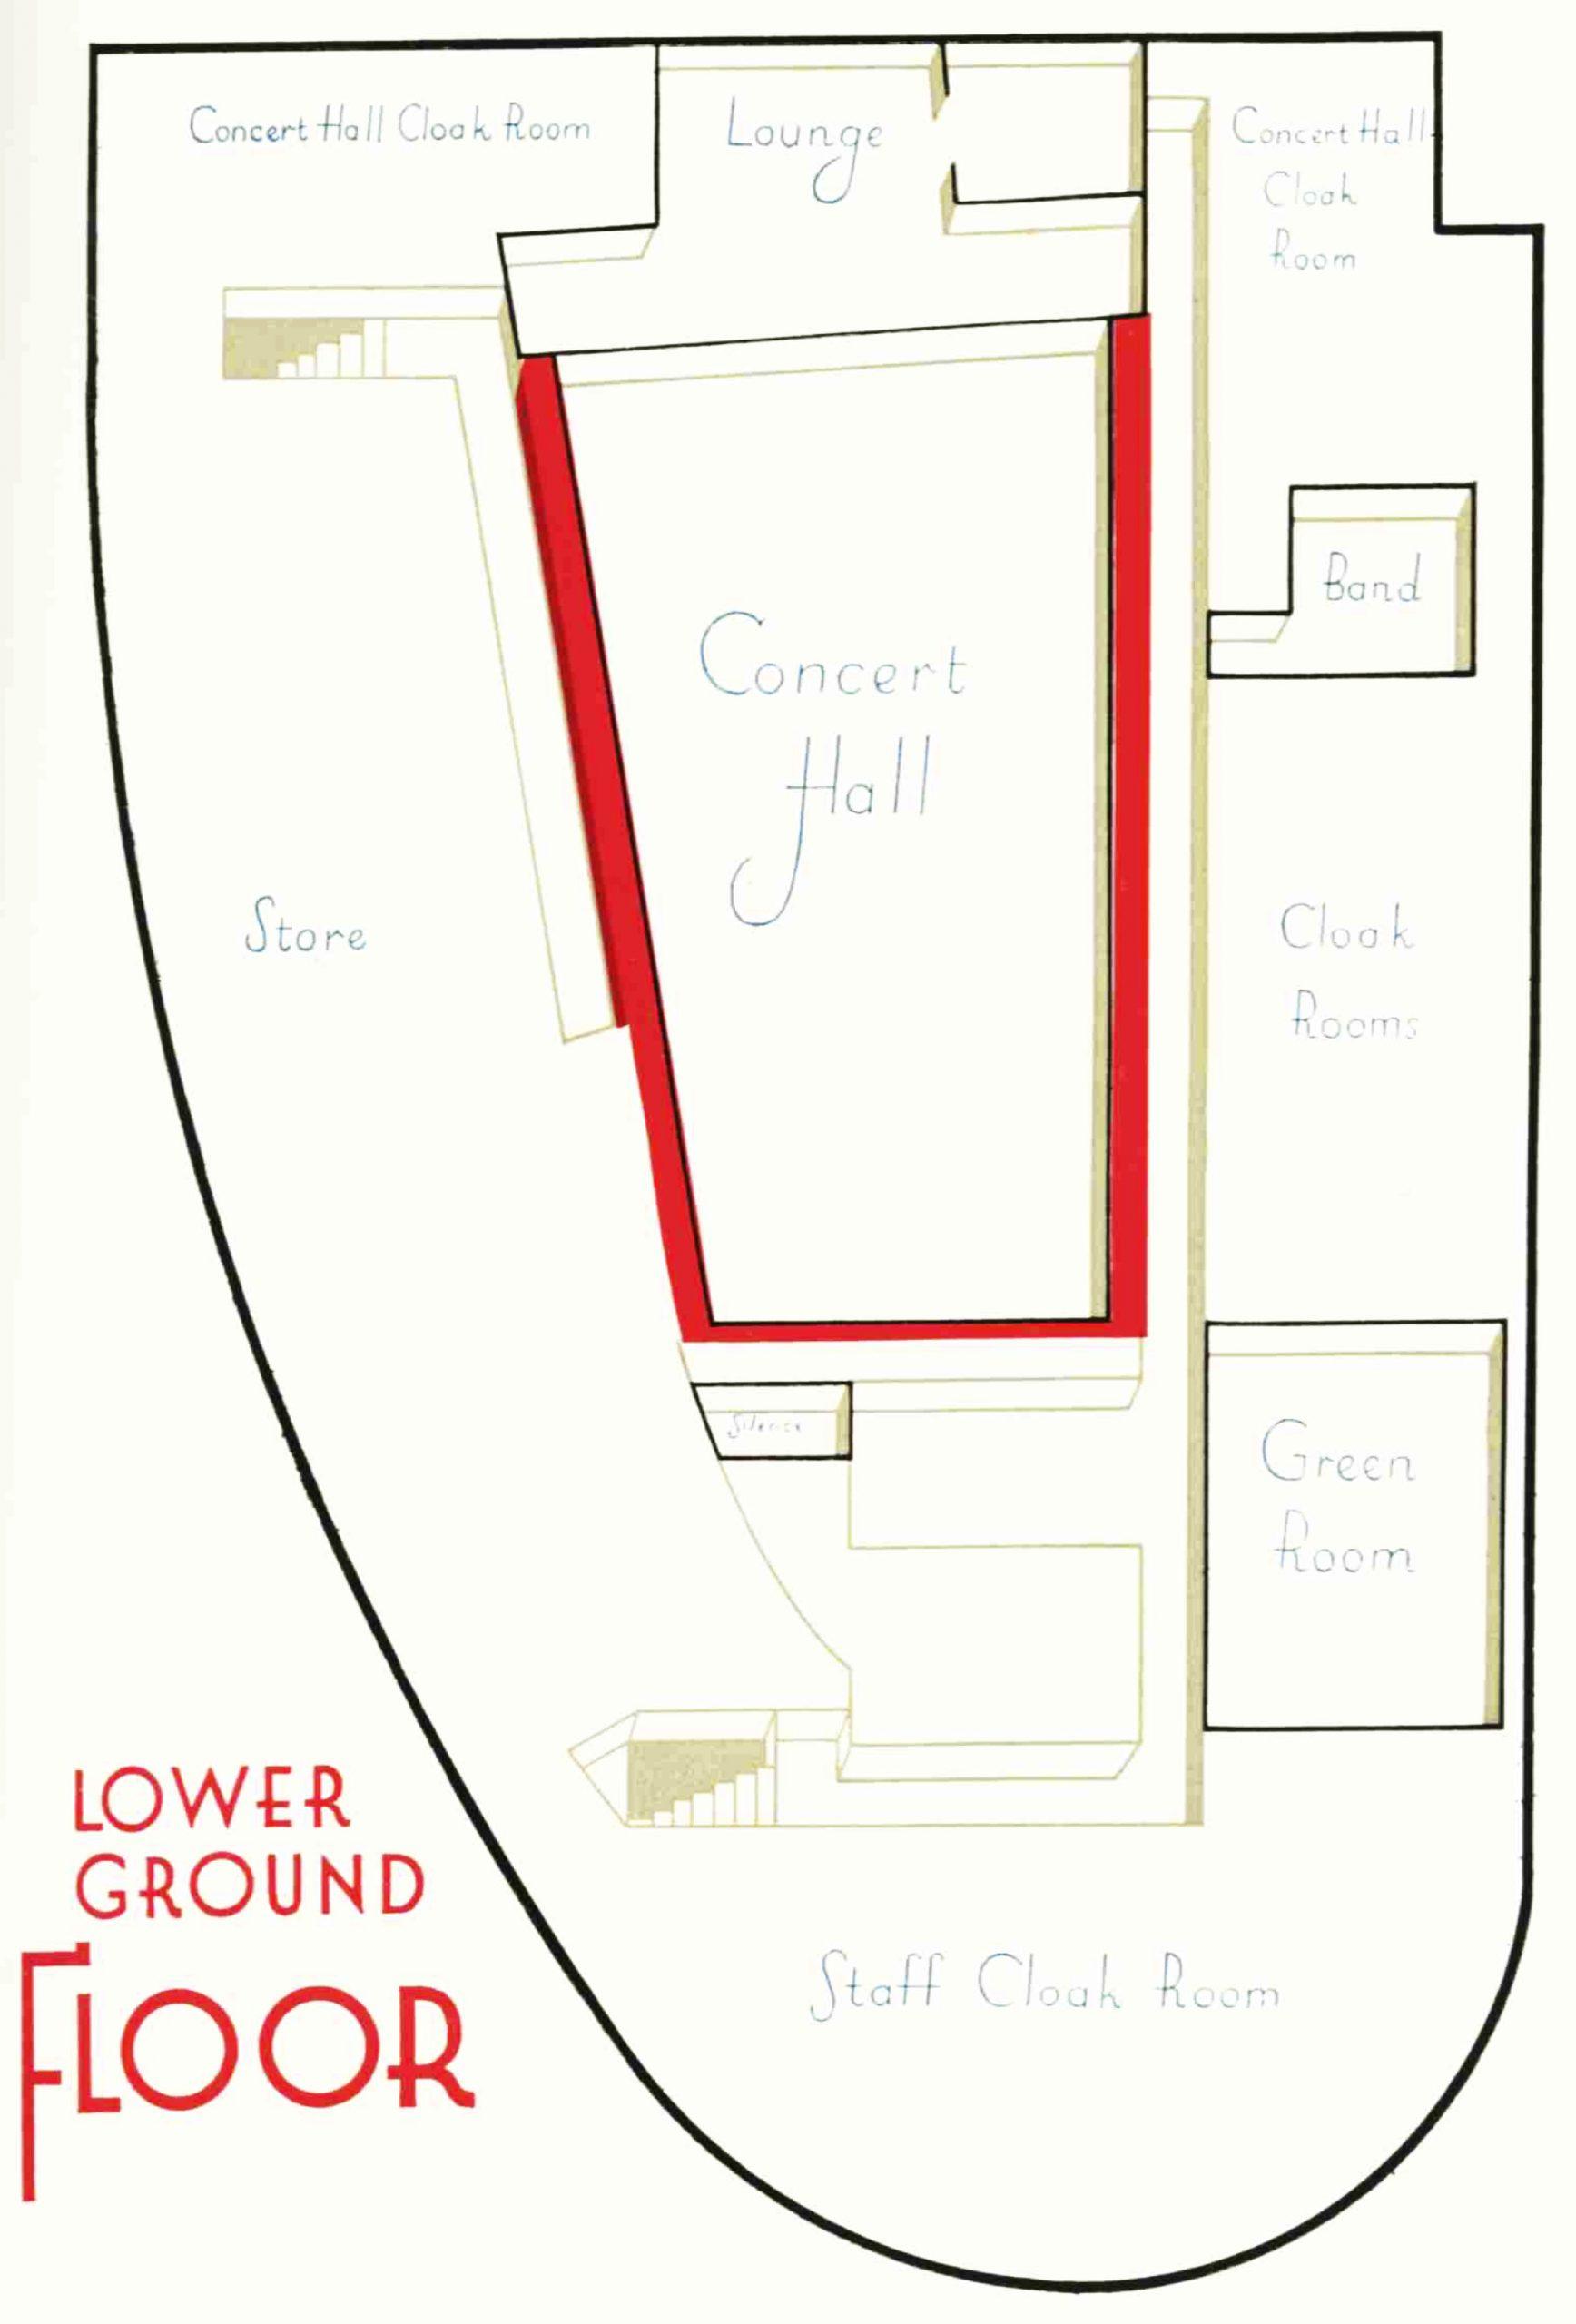 Diagram of the lower ground floor